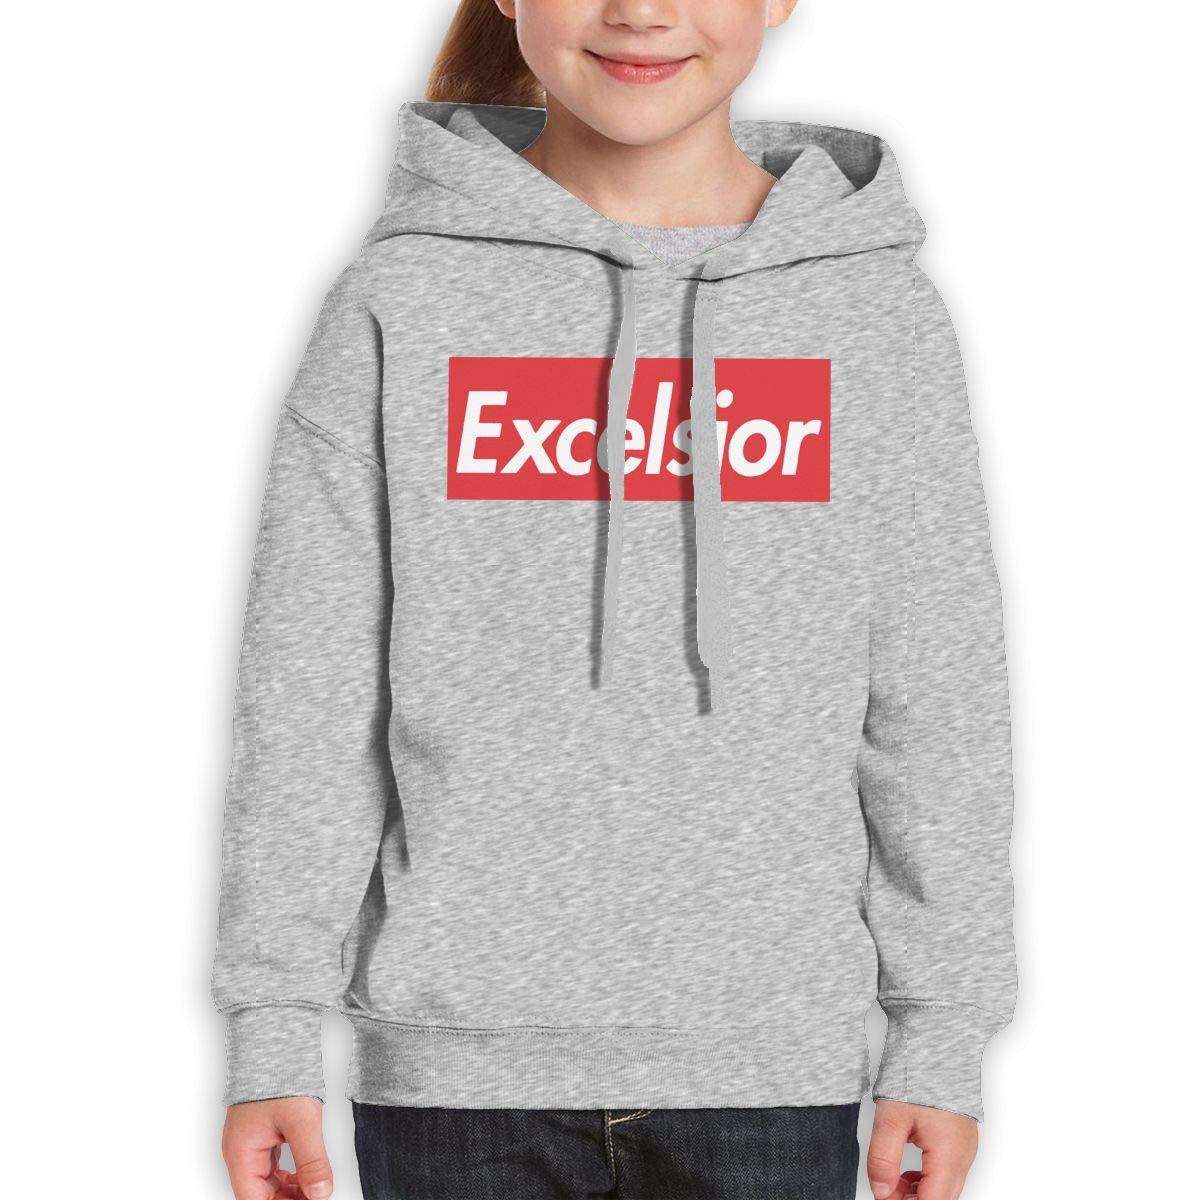 Xxxx Dtjscl Boys Girls Excelsior Teen Youth Hoody Black